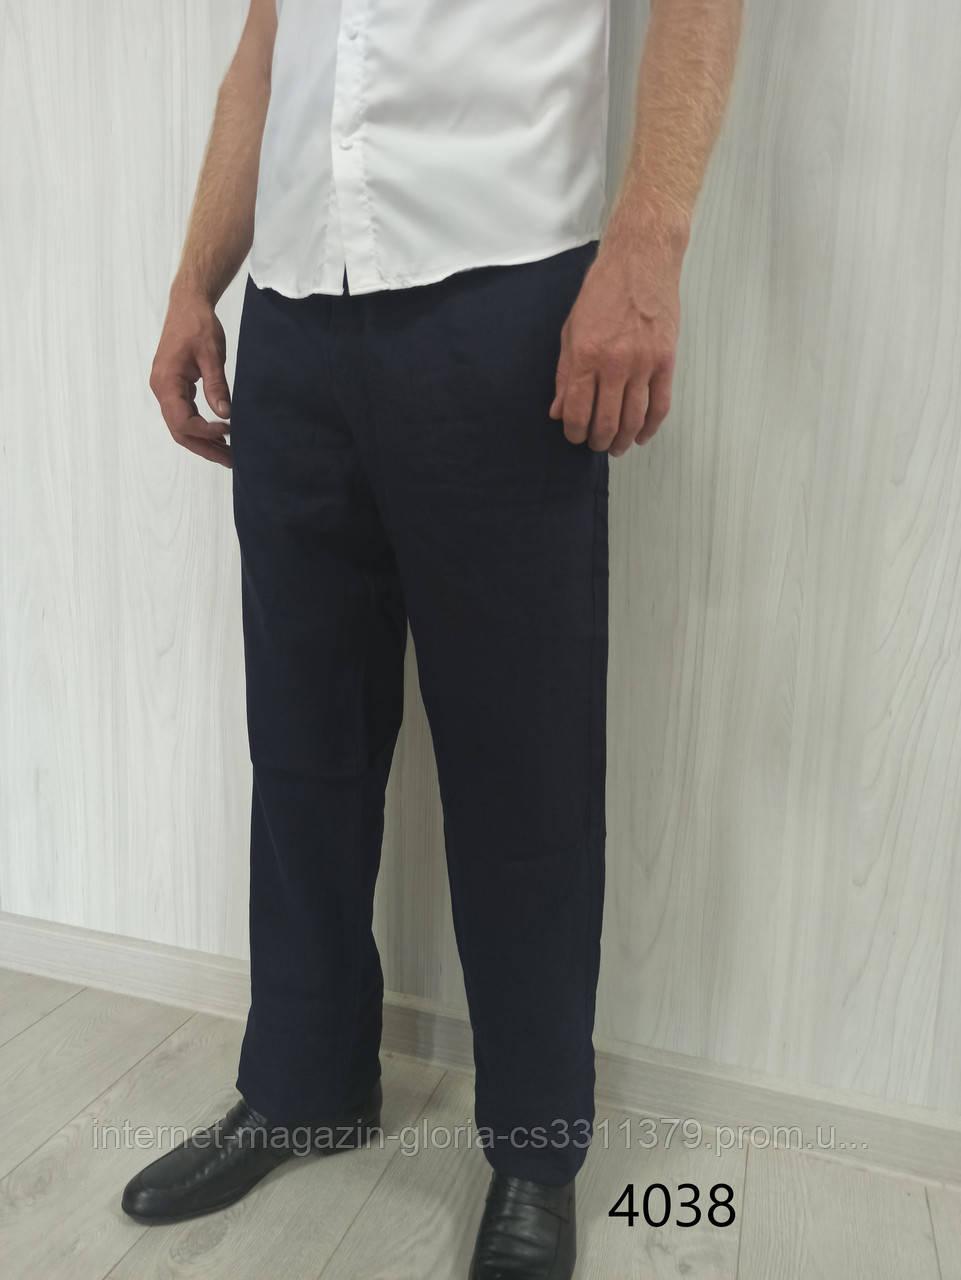 Мужские брюки Prodigy. Лён. (Linen 4038). Размеры: 33,34,35,36,38,40,42.